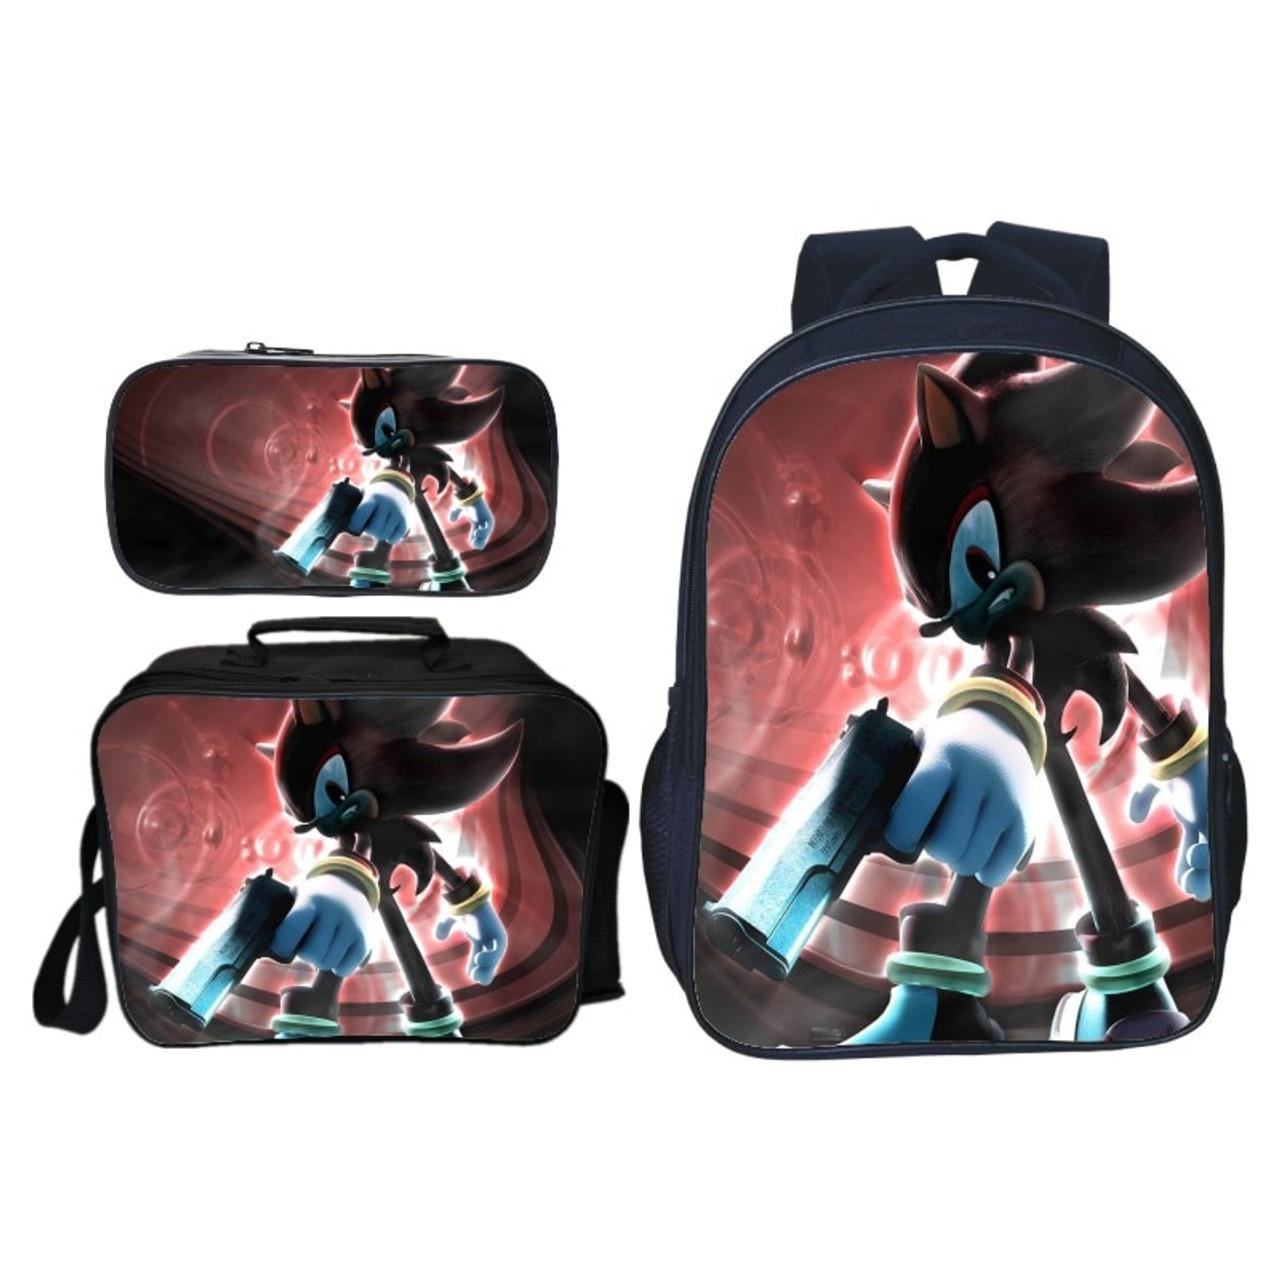 bf19ea68ea ... 3PCS set Cartoon Children Sonic Shadow Printing Backpack Kids School  Bags Boys Girls Primary Schoolbag ...